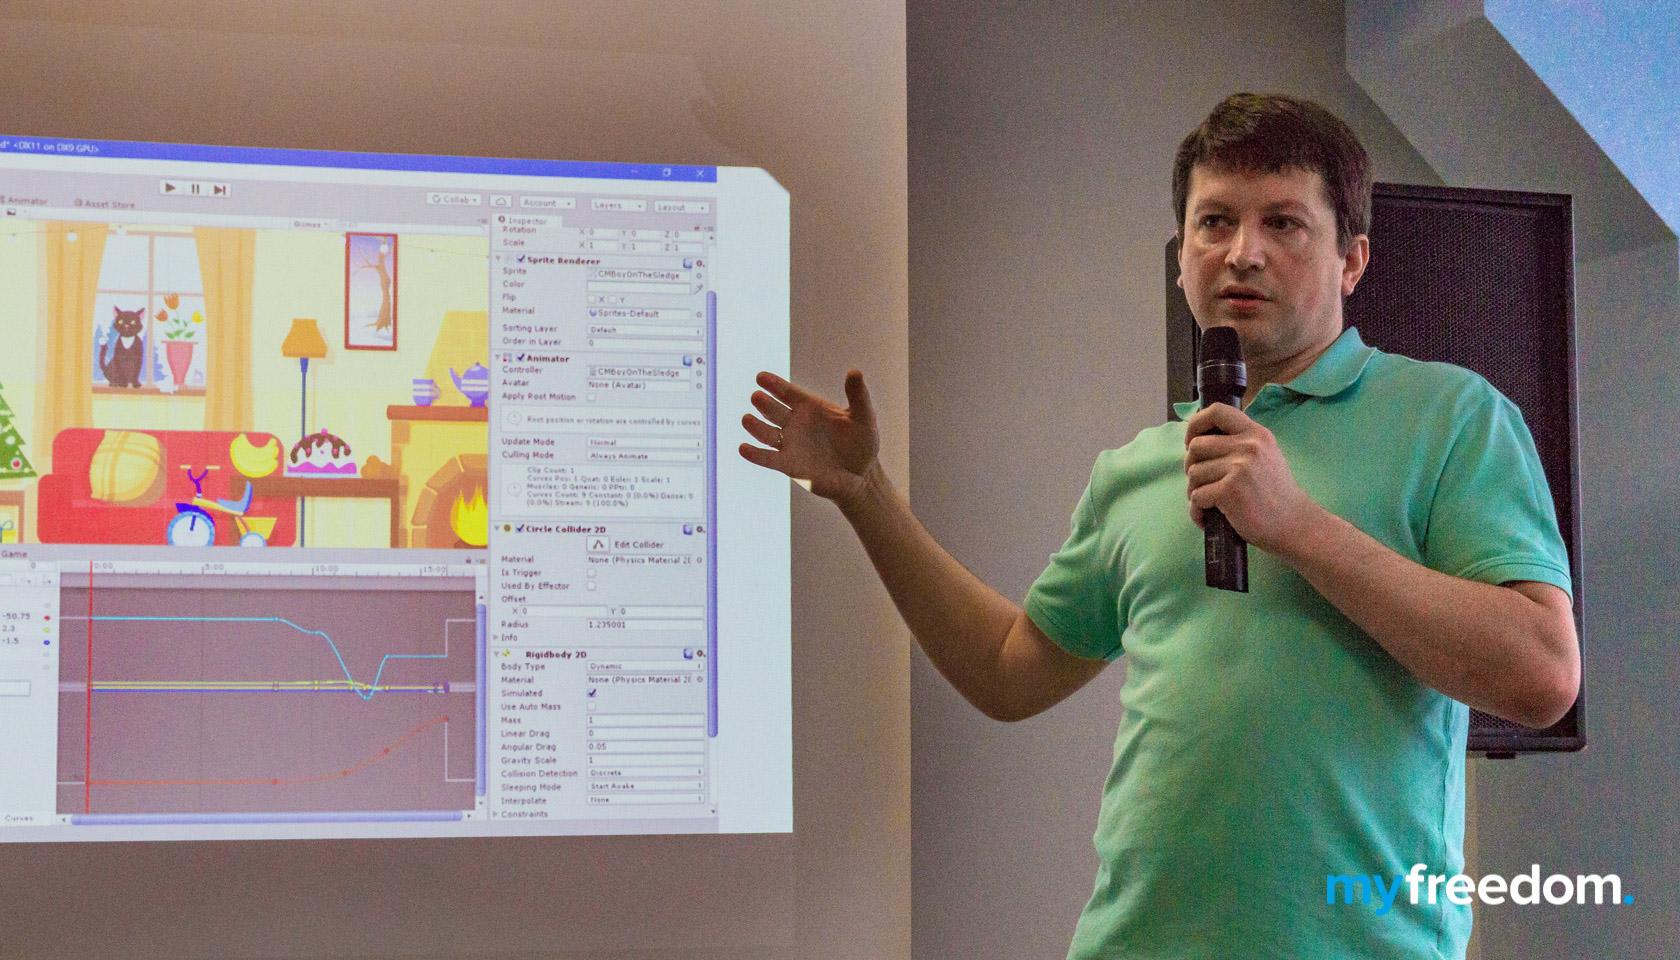 Виктор Лаврентьев на конференция Pro.IT в Бресте. Myfreedom - первая IT-школа в Бресте